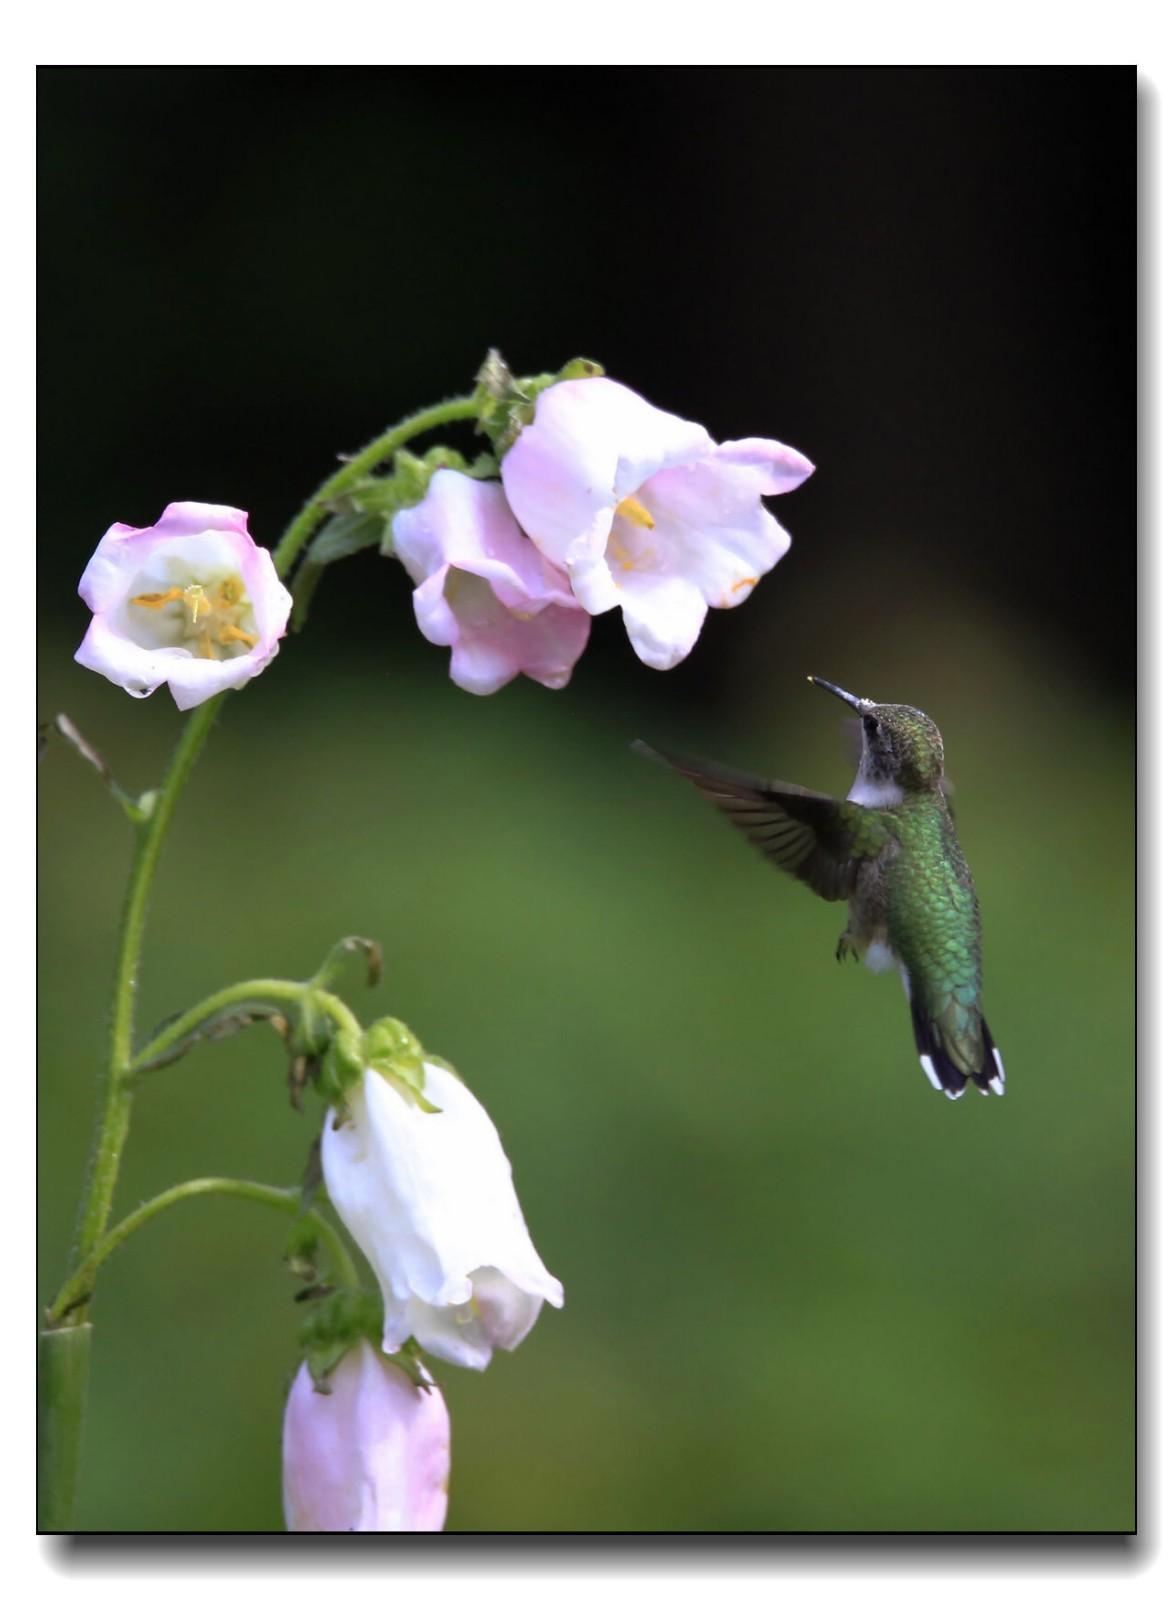 蜂鸟组图(六)_图1-13